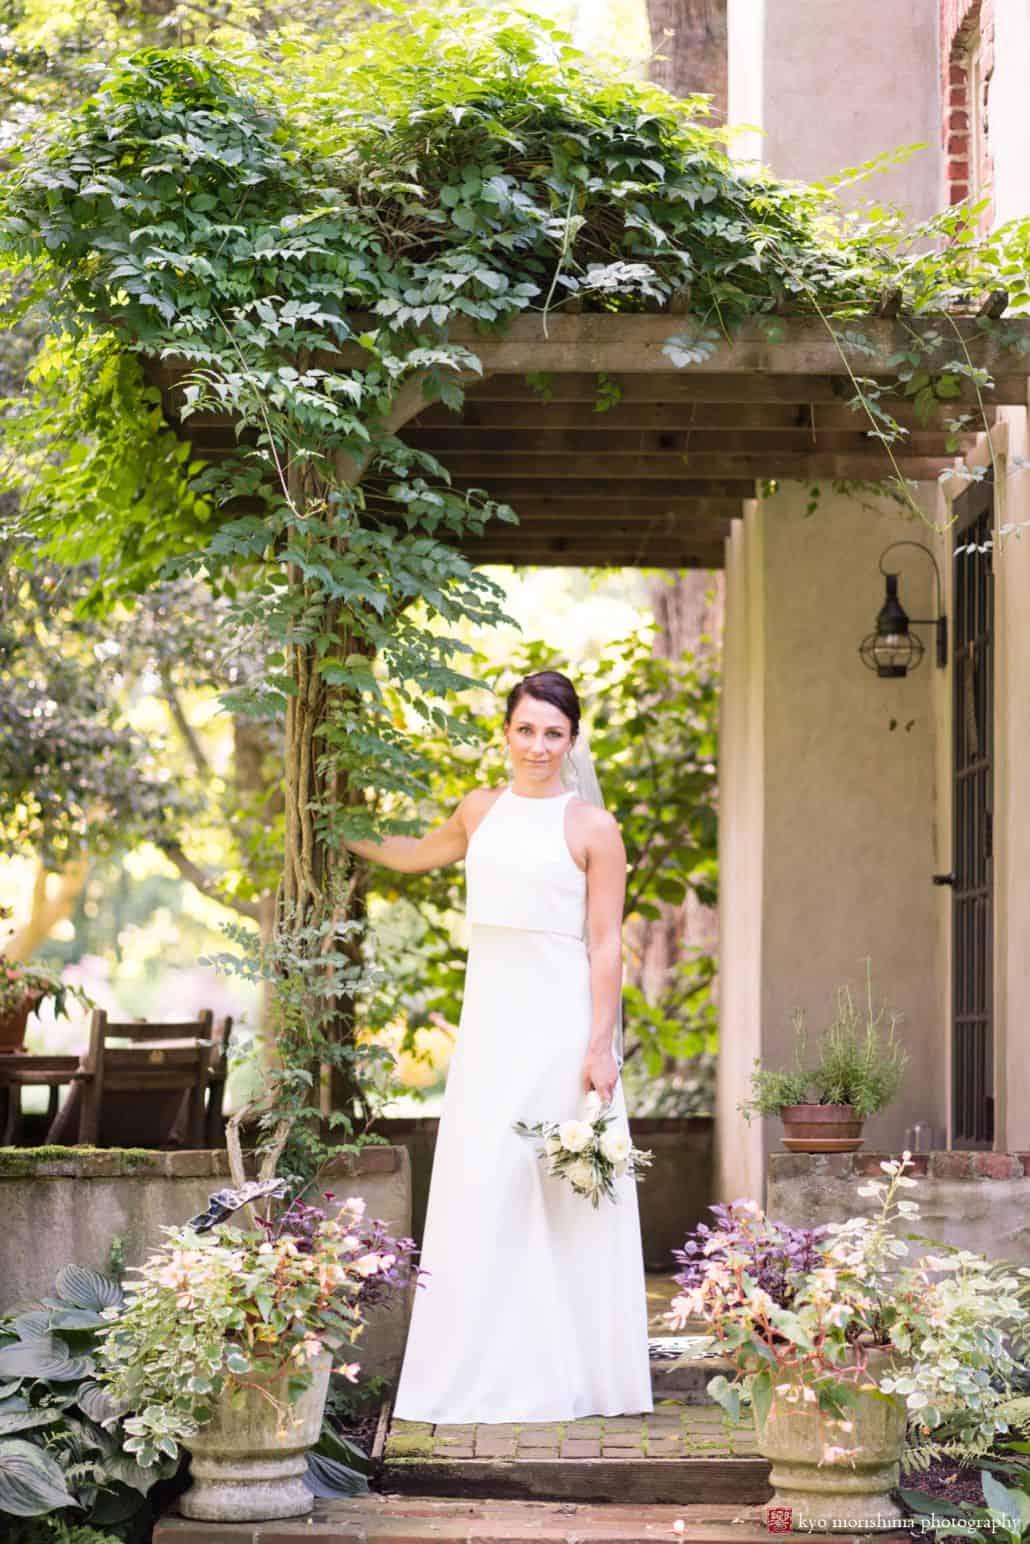 Portrait of bride under vine covered pergola holding white rose bouquet, BHLDN wedding dress, The Pod Shop Flowers, August New Hope, PA wedding photographer.